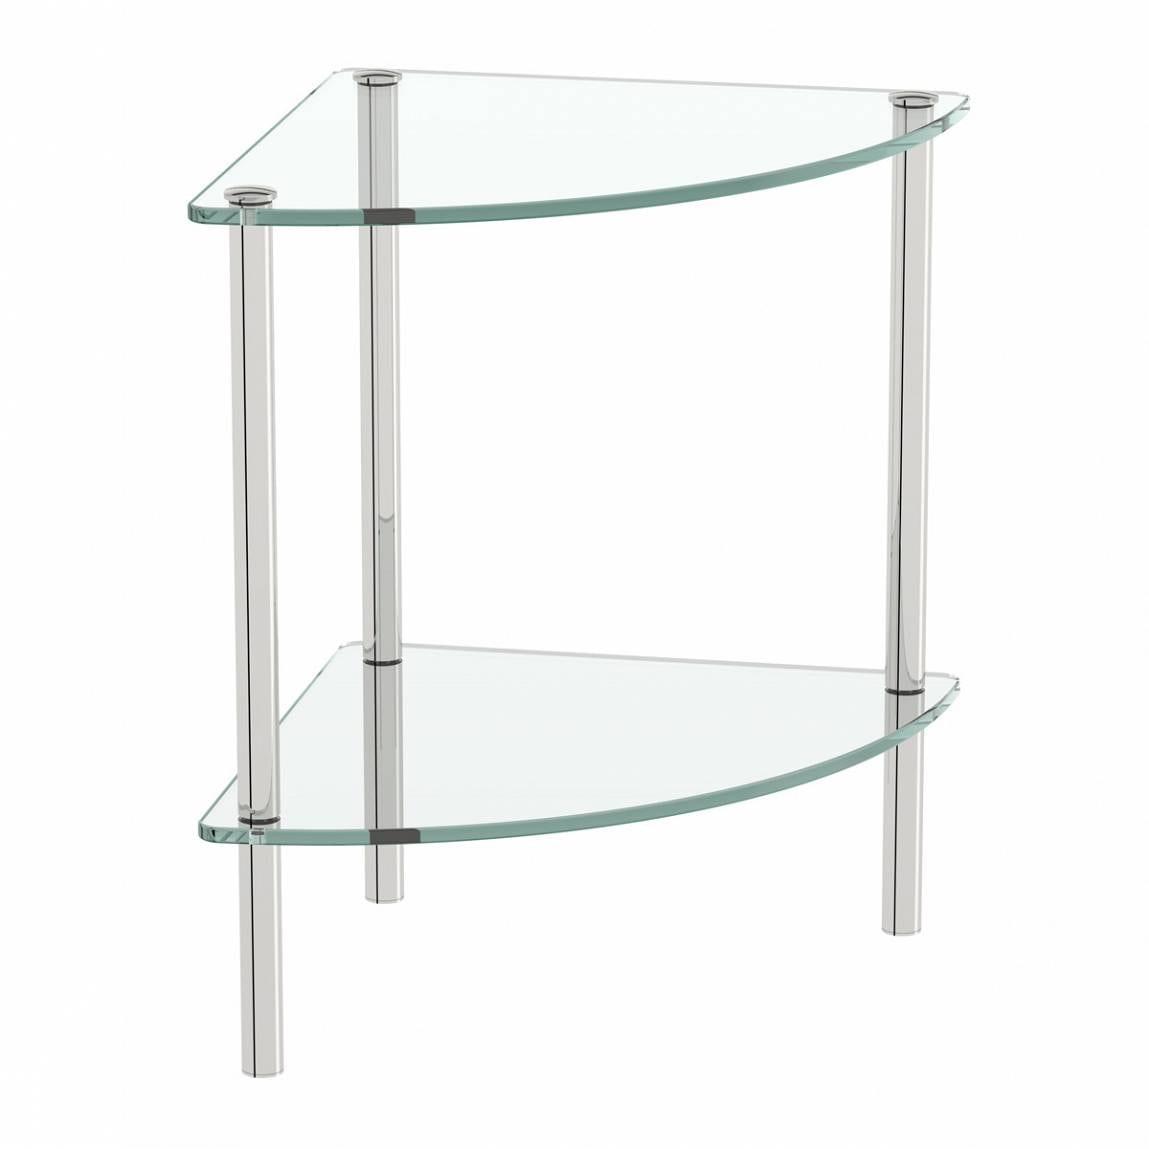 Options freestanding quadrant 2 glass shelf unit - Glass free standing shelves ...